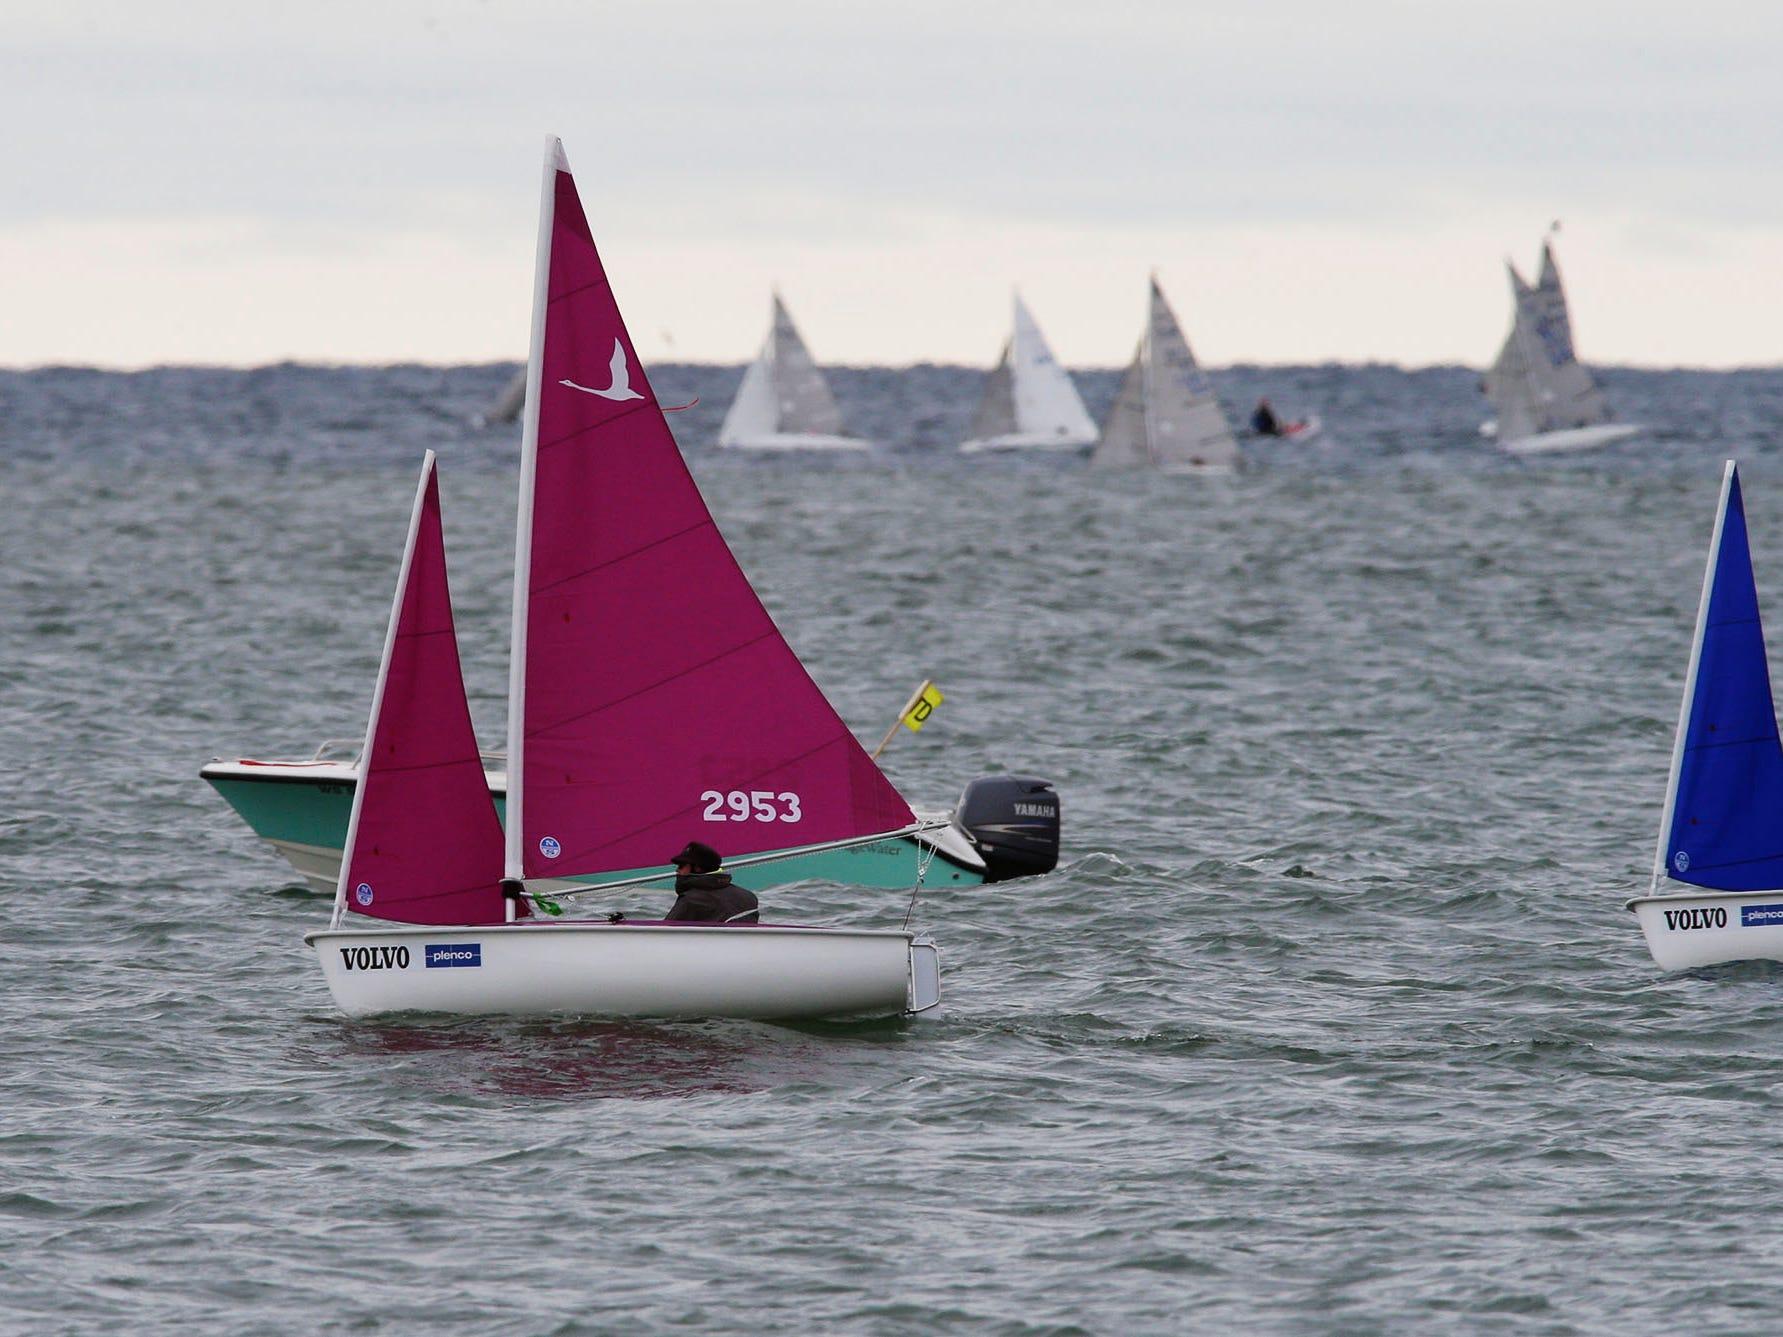 A group of sailors pilot their Hansa 303 sailboats during the Para World Sailing Championships, Tuesday, September 18, 2018, in Sheboygan, Wis.